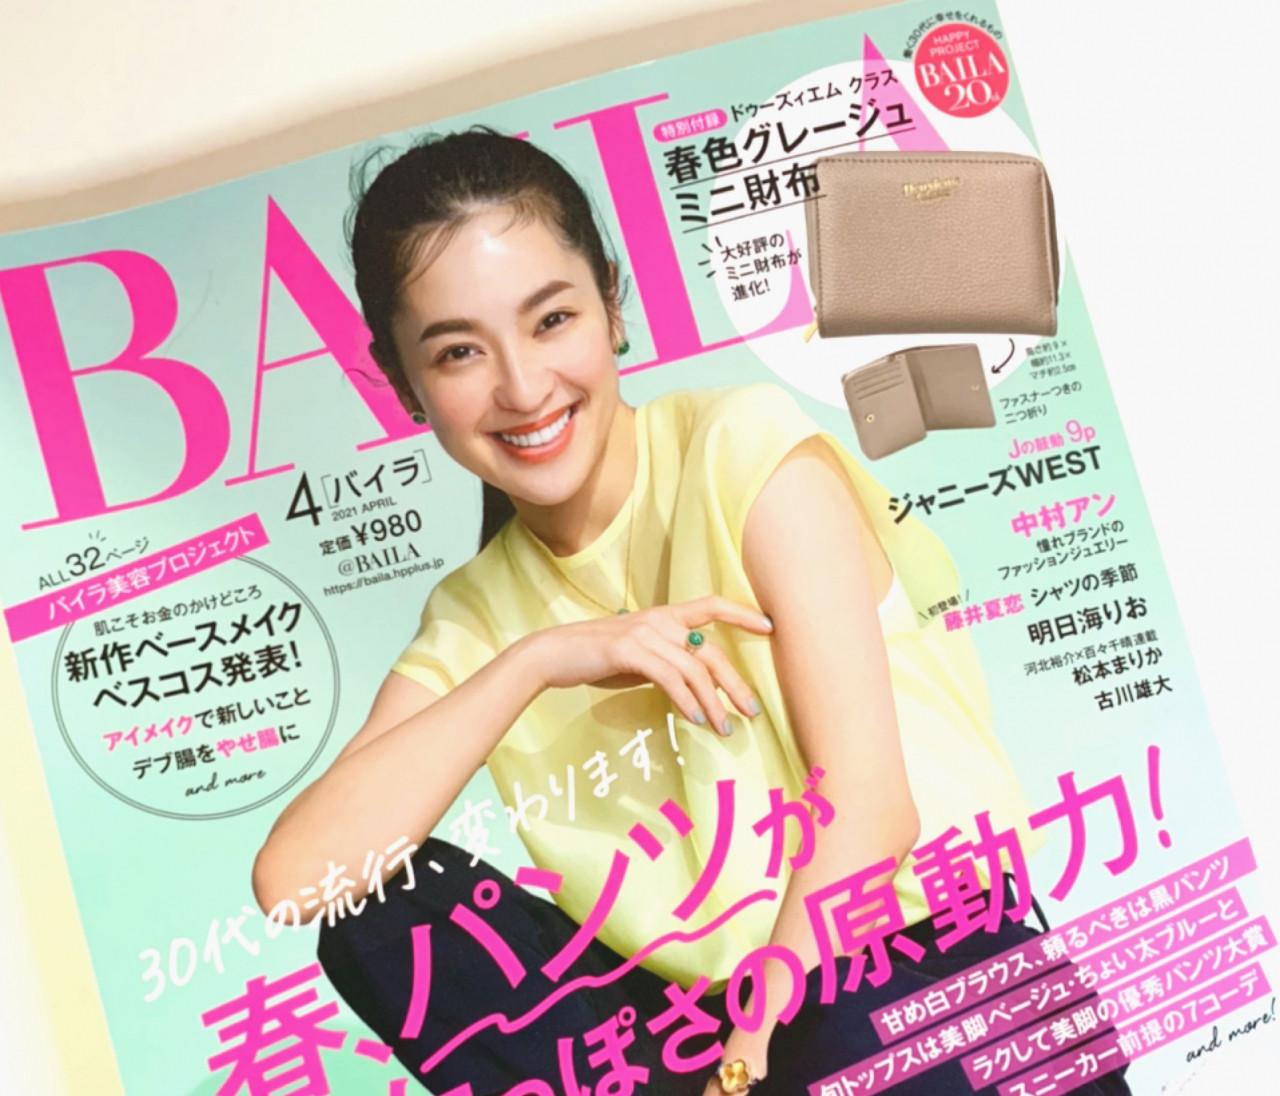 BAILA4月号発売中✳︎付録は大好評春色ミニ財布!